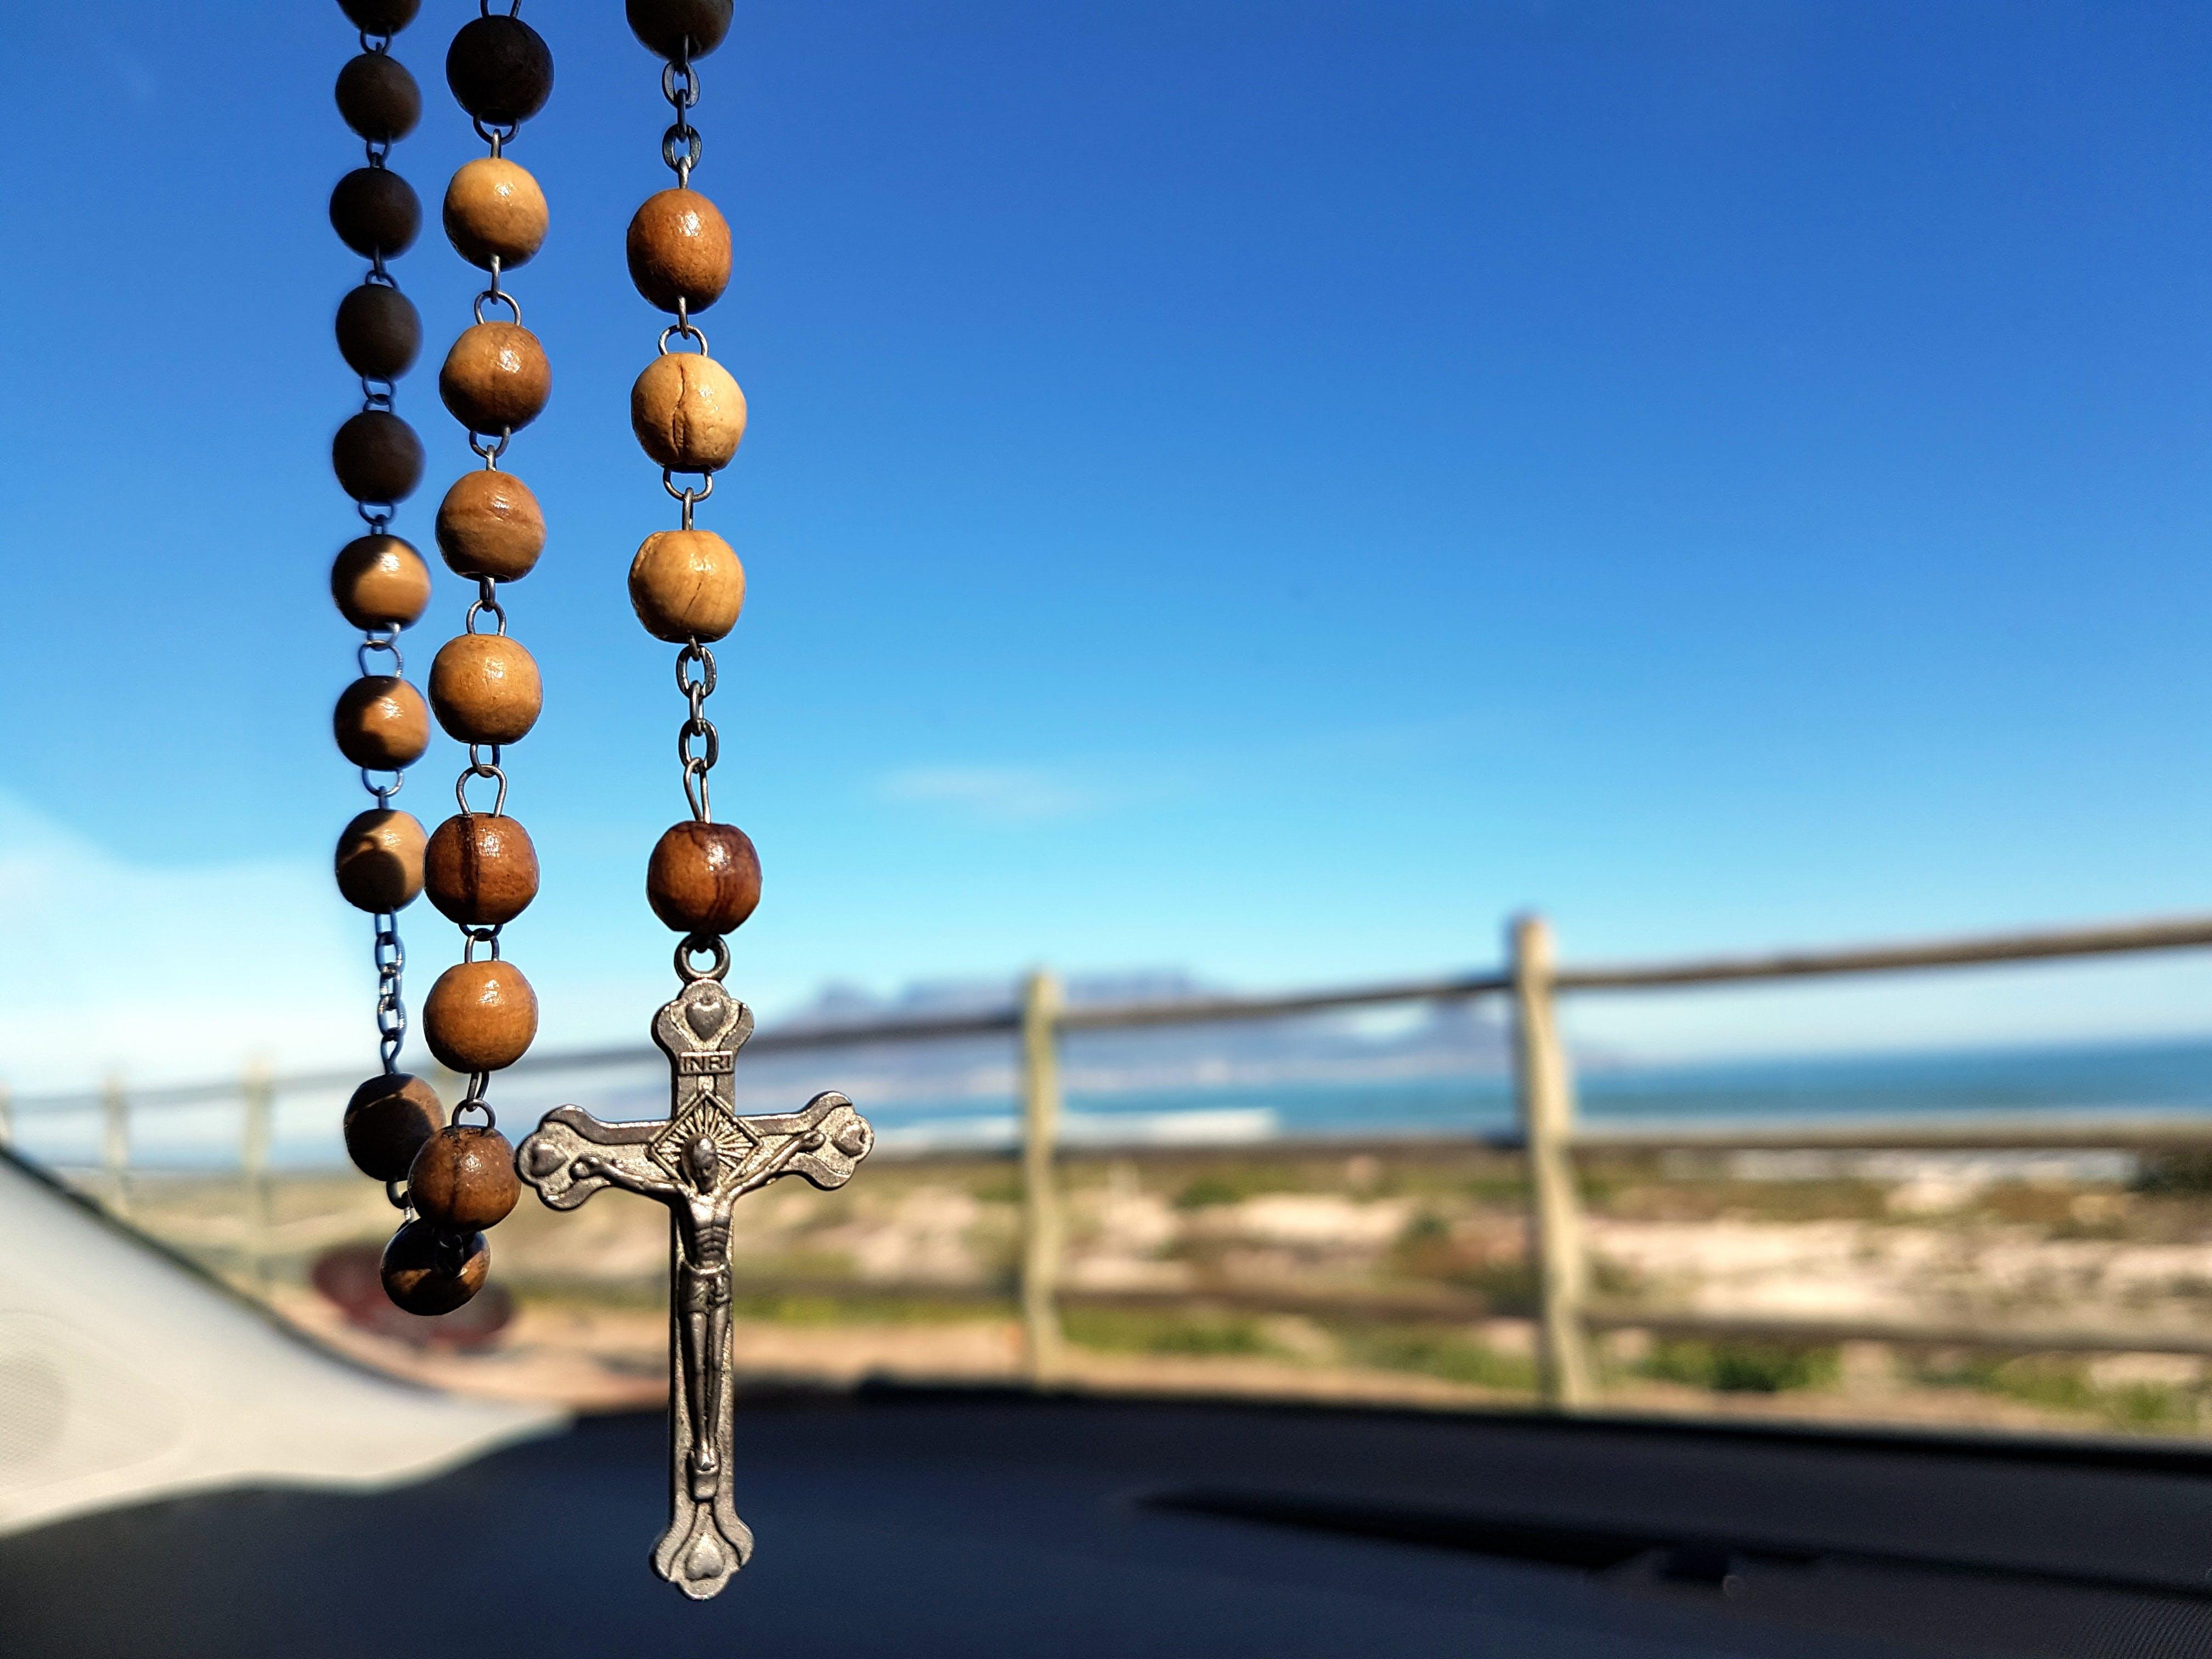 Photos gratuites de brillant, brouiller, catholicisme, catholique